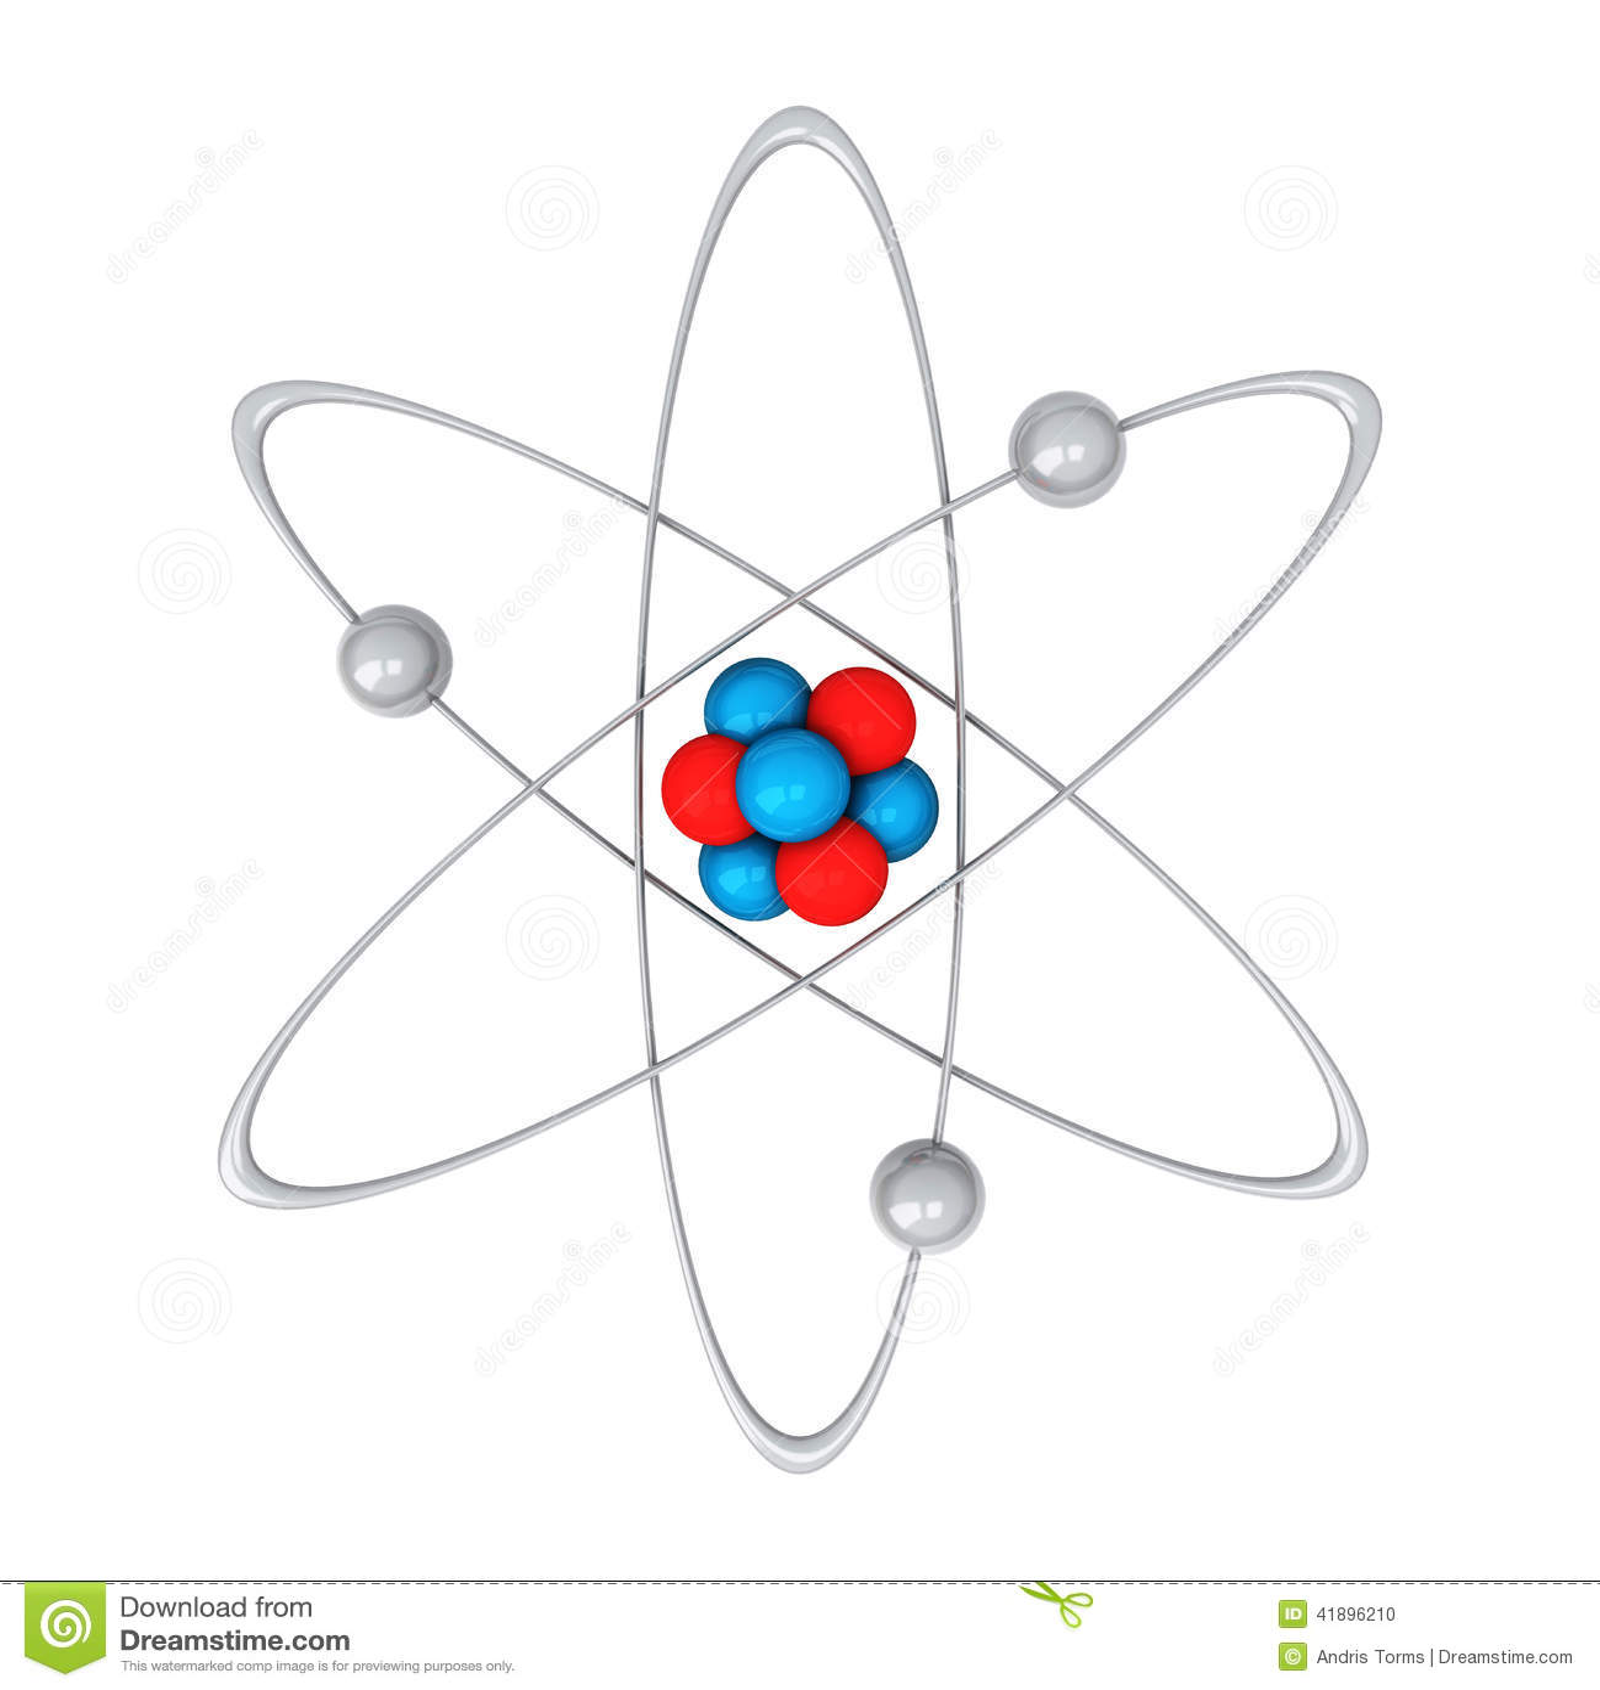 atome, électron stable, électron libre